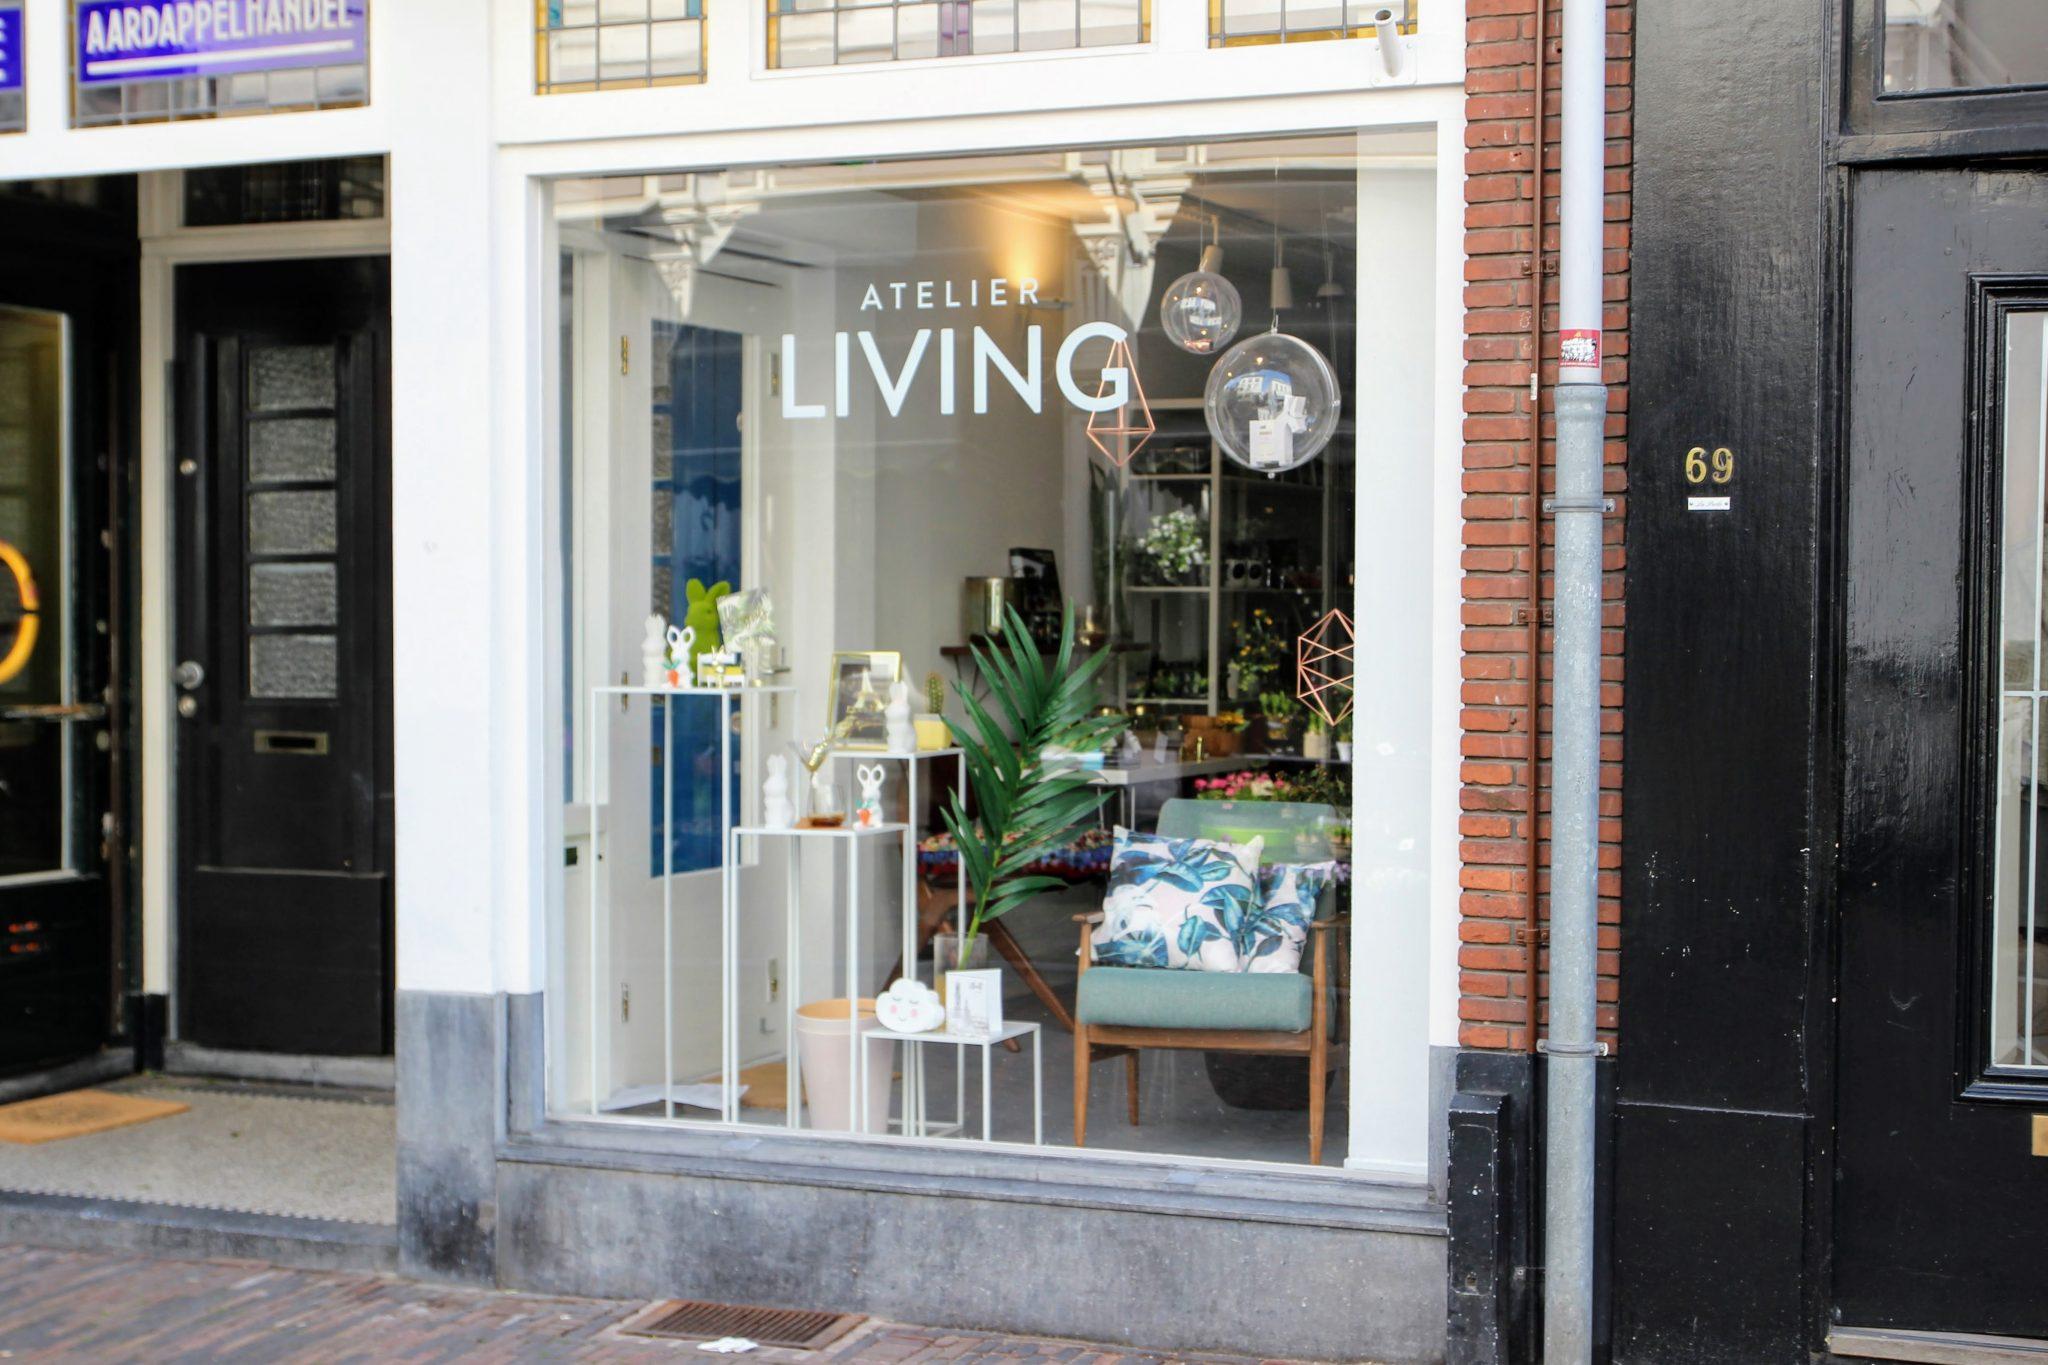 atelier-living-utrecht